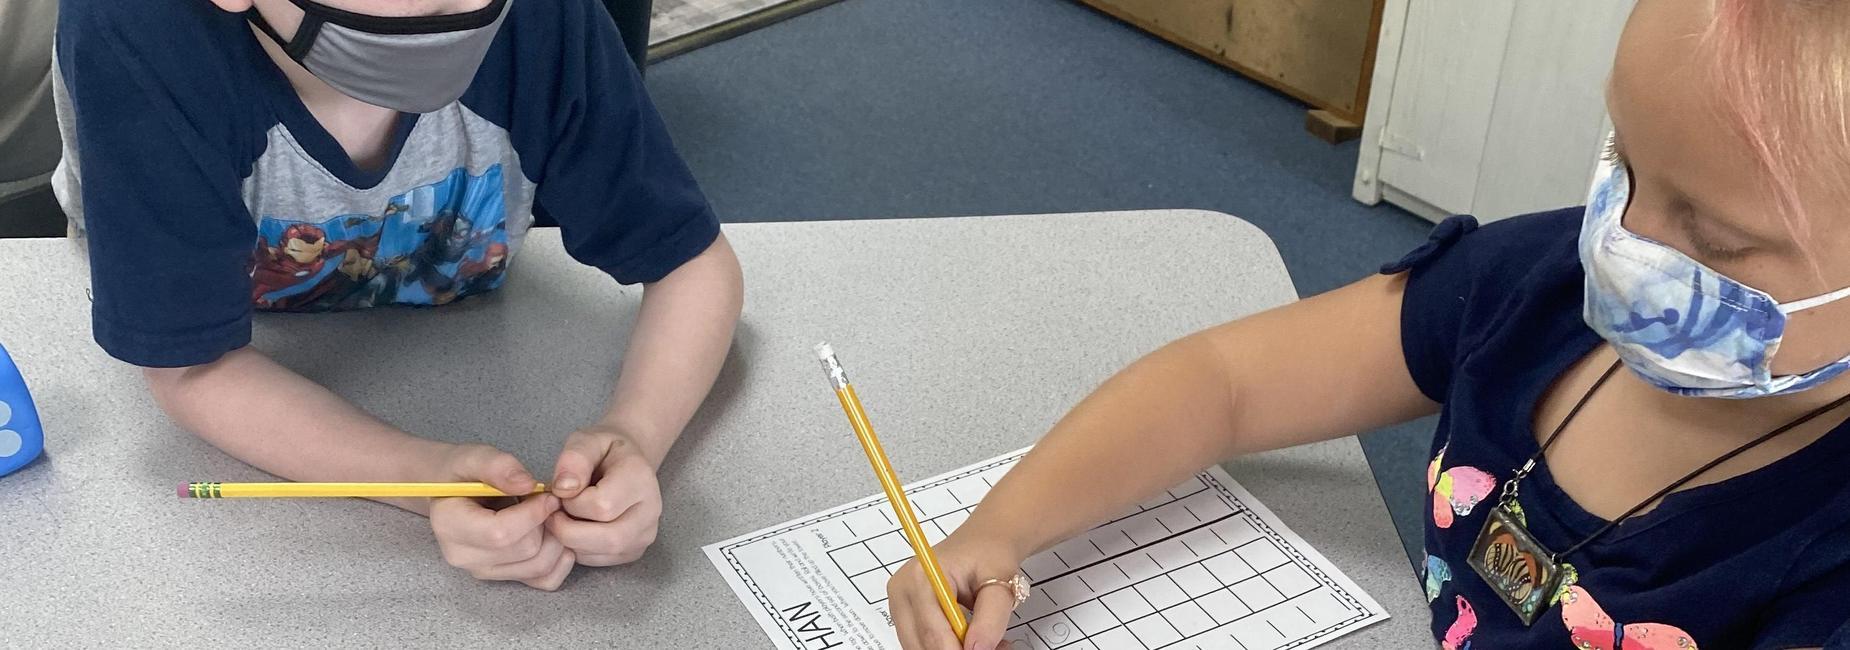 1st grade students performing math activity